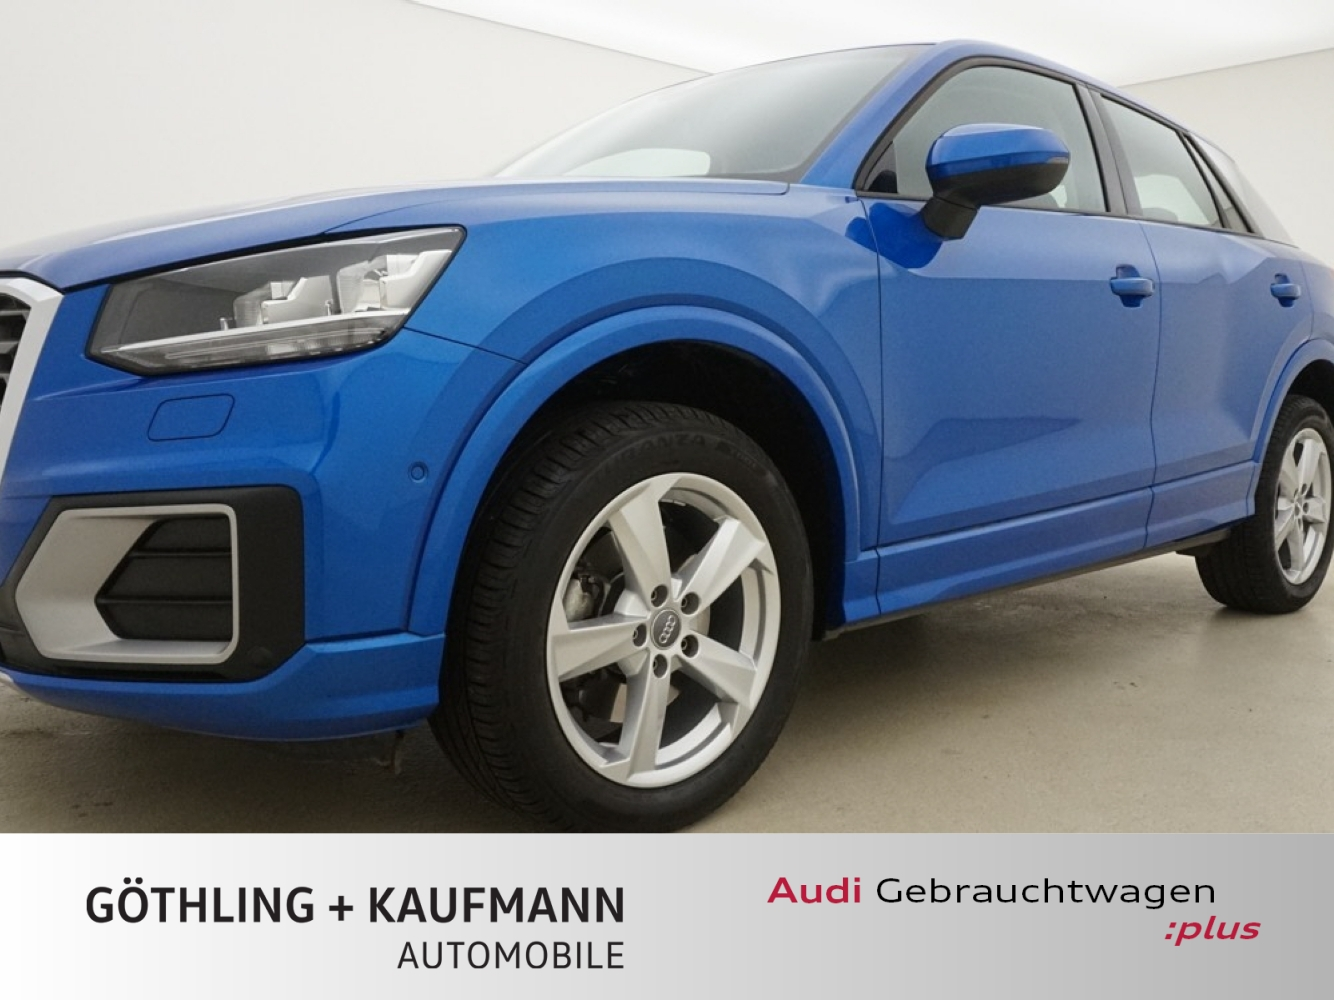 Audi Q2 1.4 TFSI Sport S tro.110kW*ACC*Kamera*Navi*Bl, Jahr 2017, Benzin